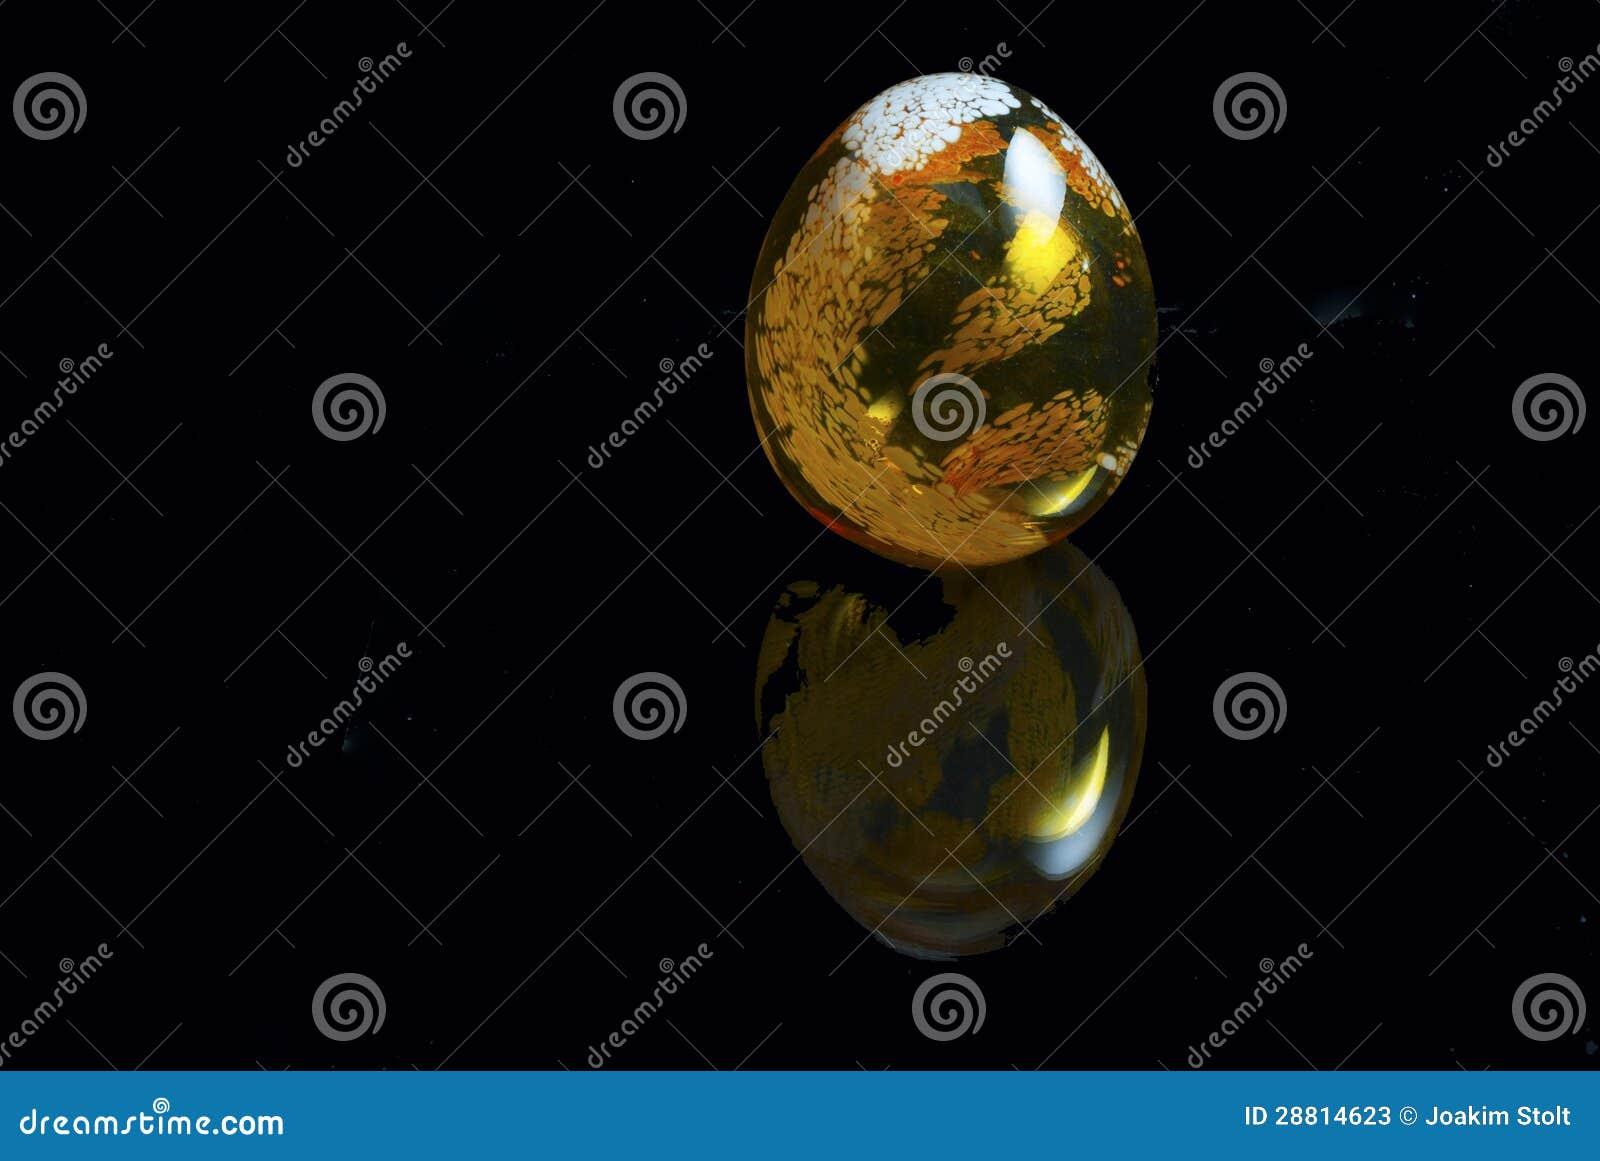 Huevo de cristal